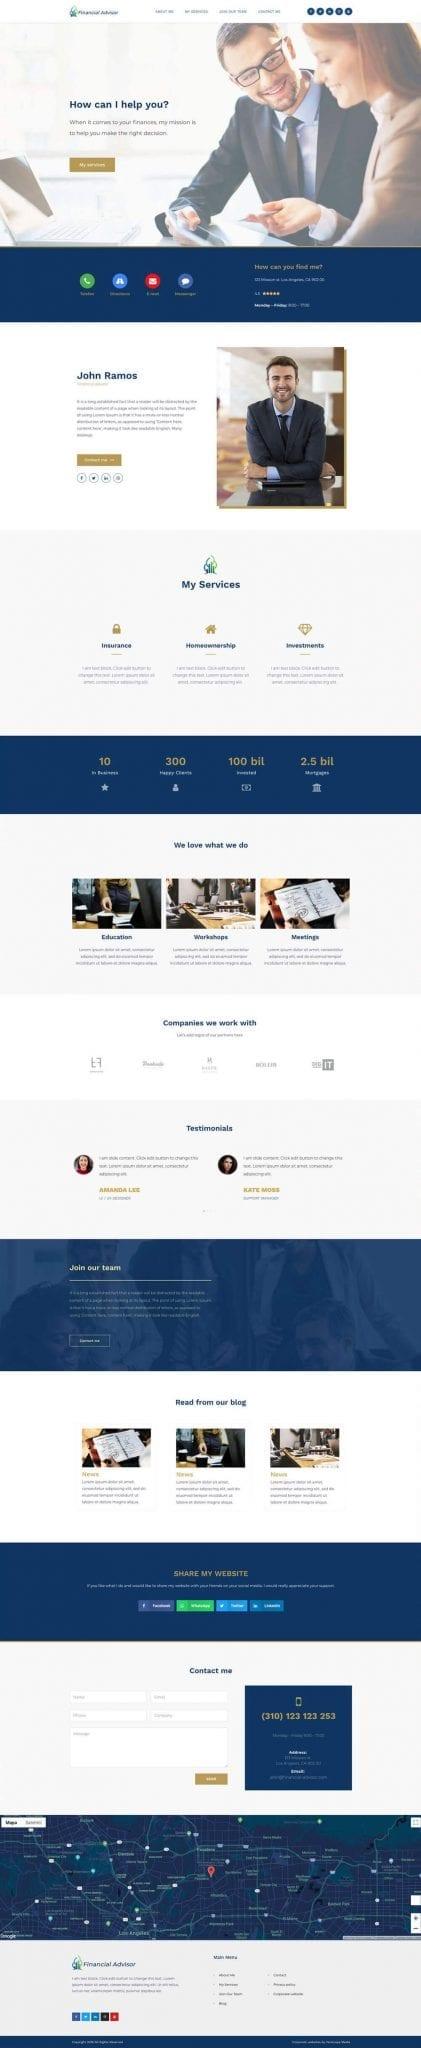 Website for financial advisors type of business